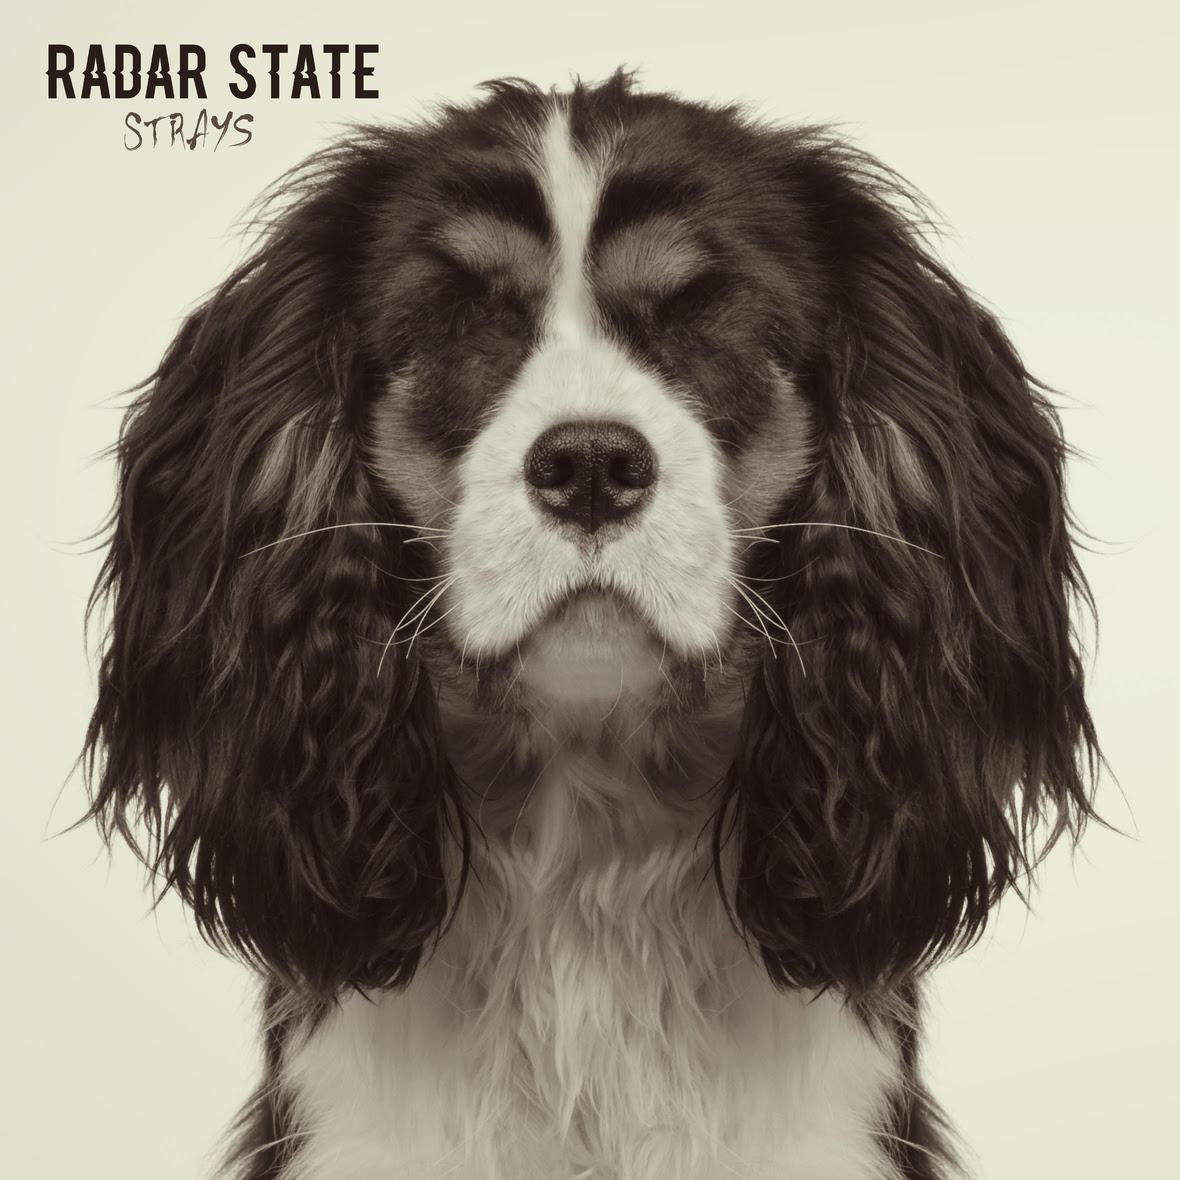 RADAR STATE STRAYS